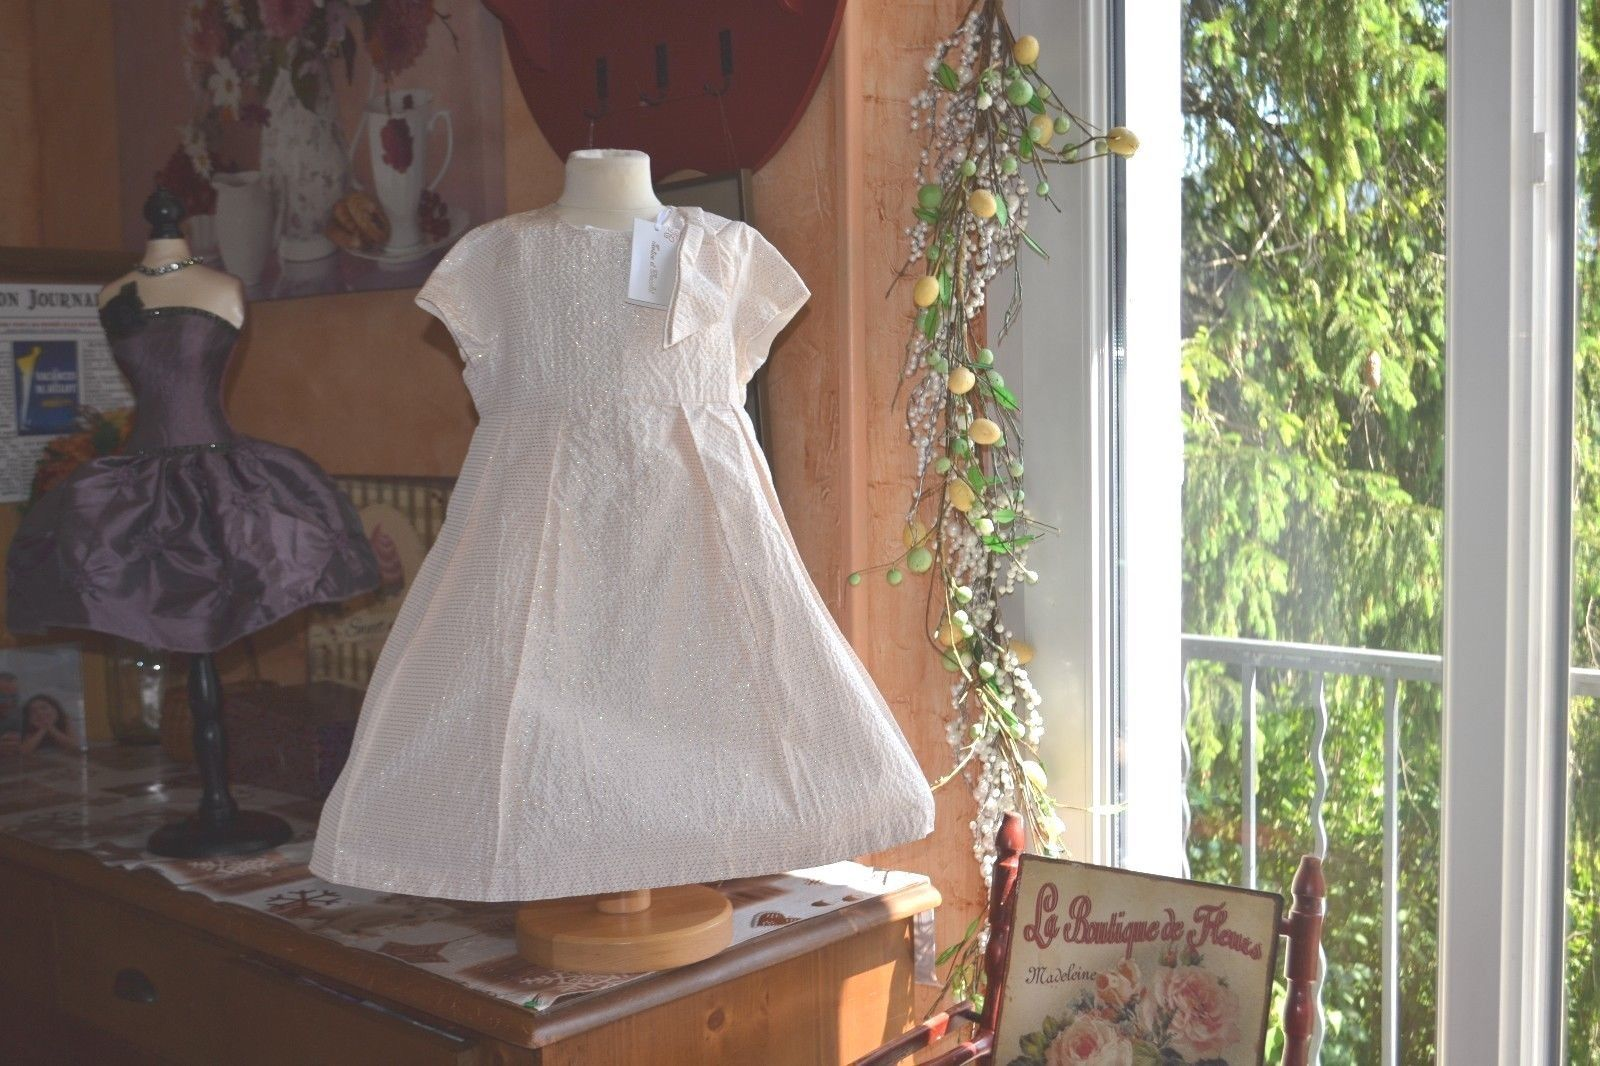 Robe de Mariage Cérémonie Fille avec Boléro Brodé Satin et Organza Pierre-cedric